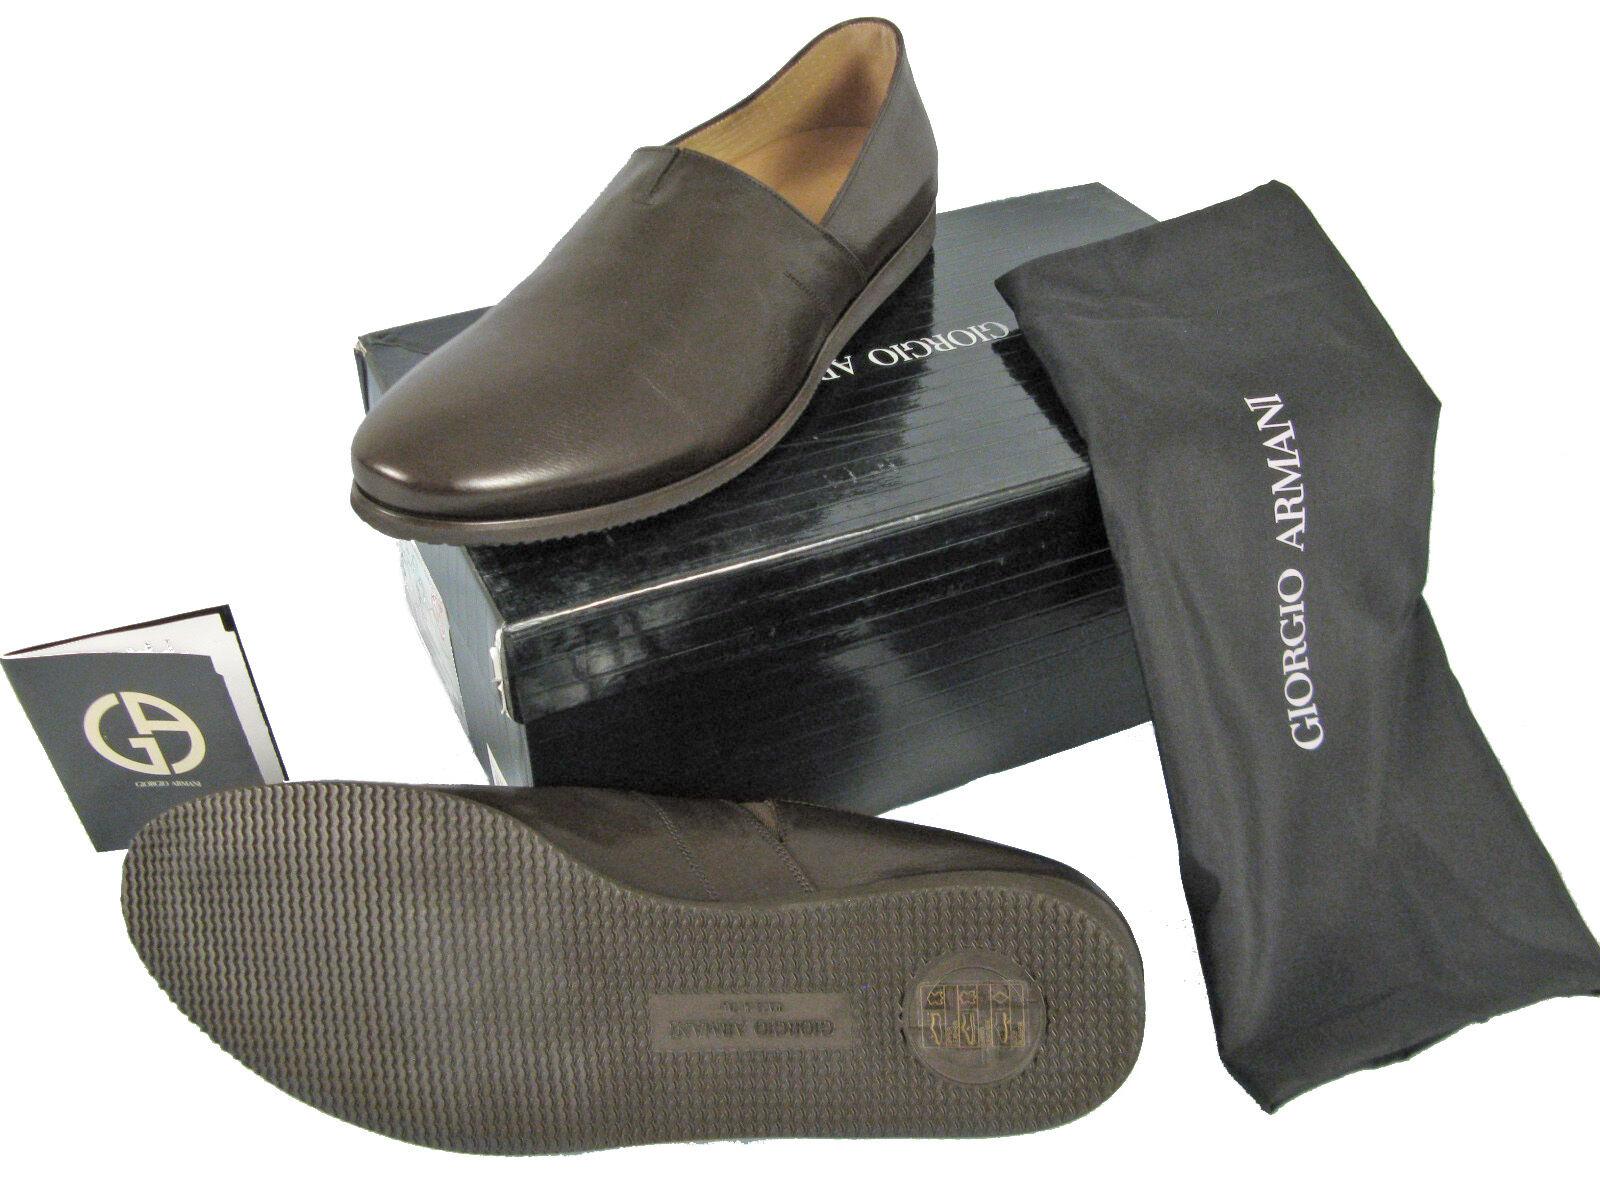 NEW  645 Giorgio Armani Uomo Shoes!  e 45 Approx   12   Casual Brown Slipons